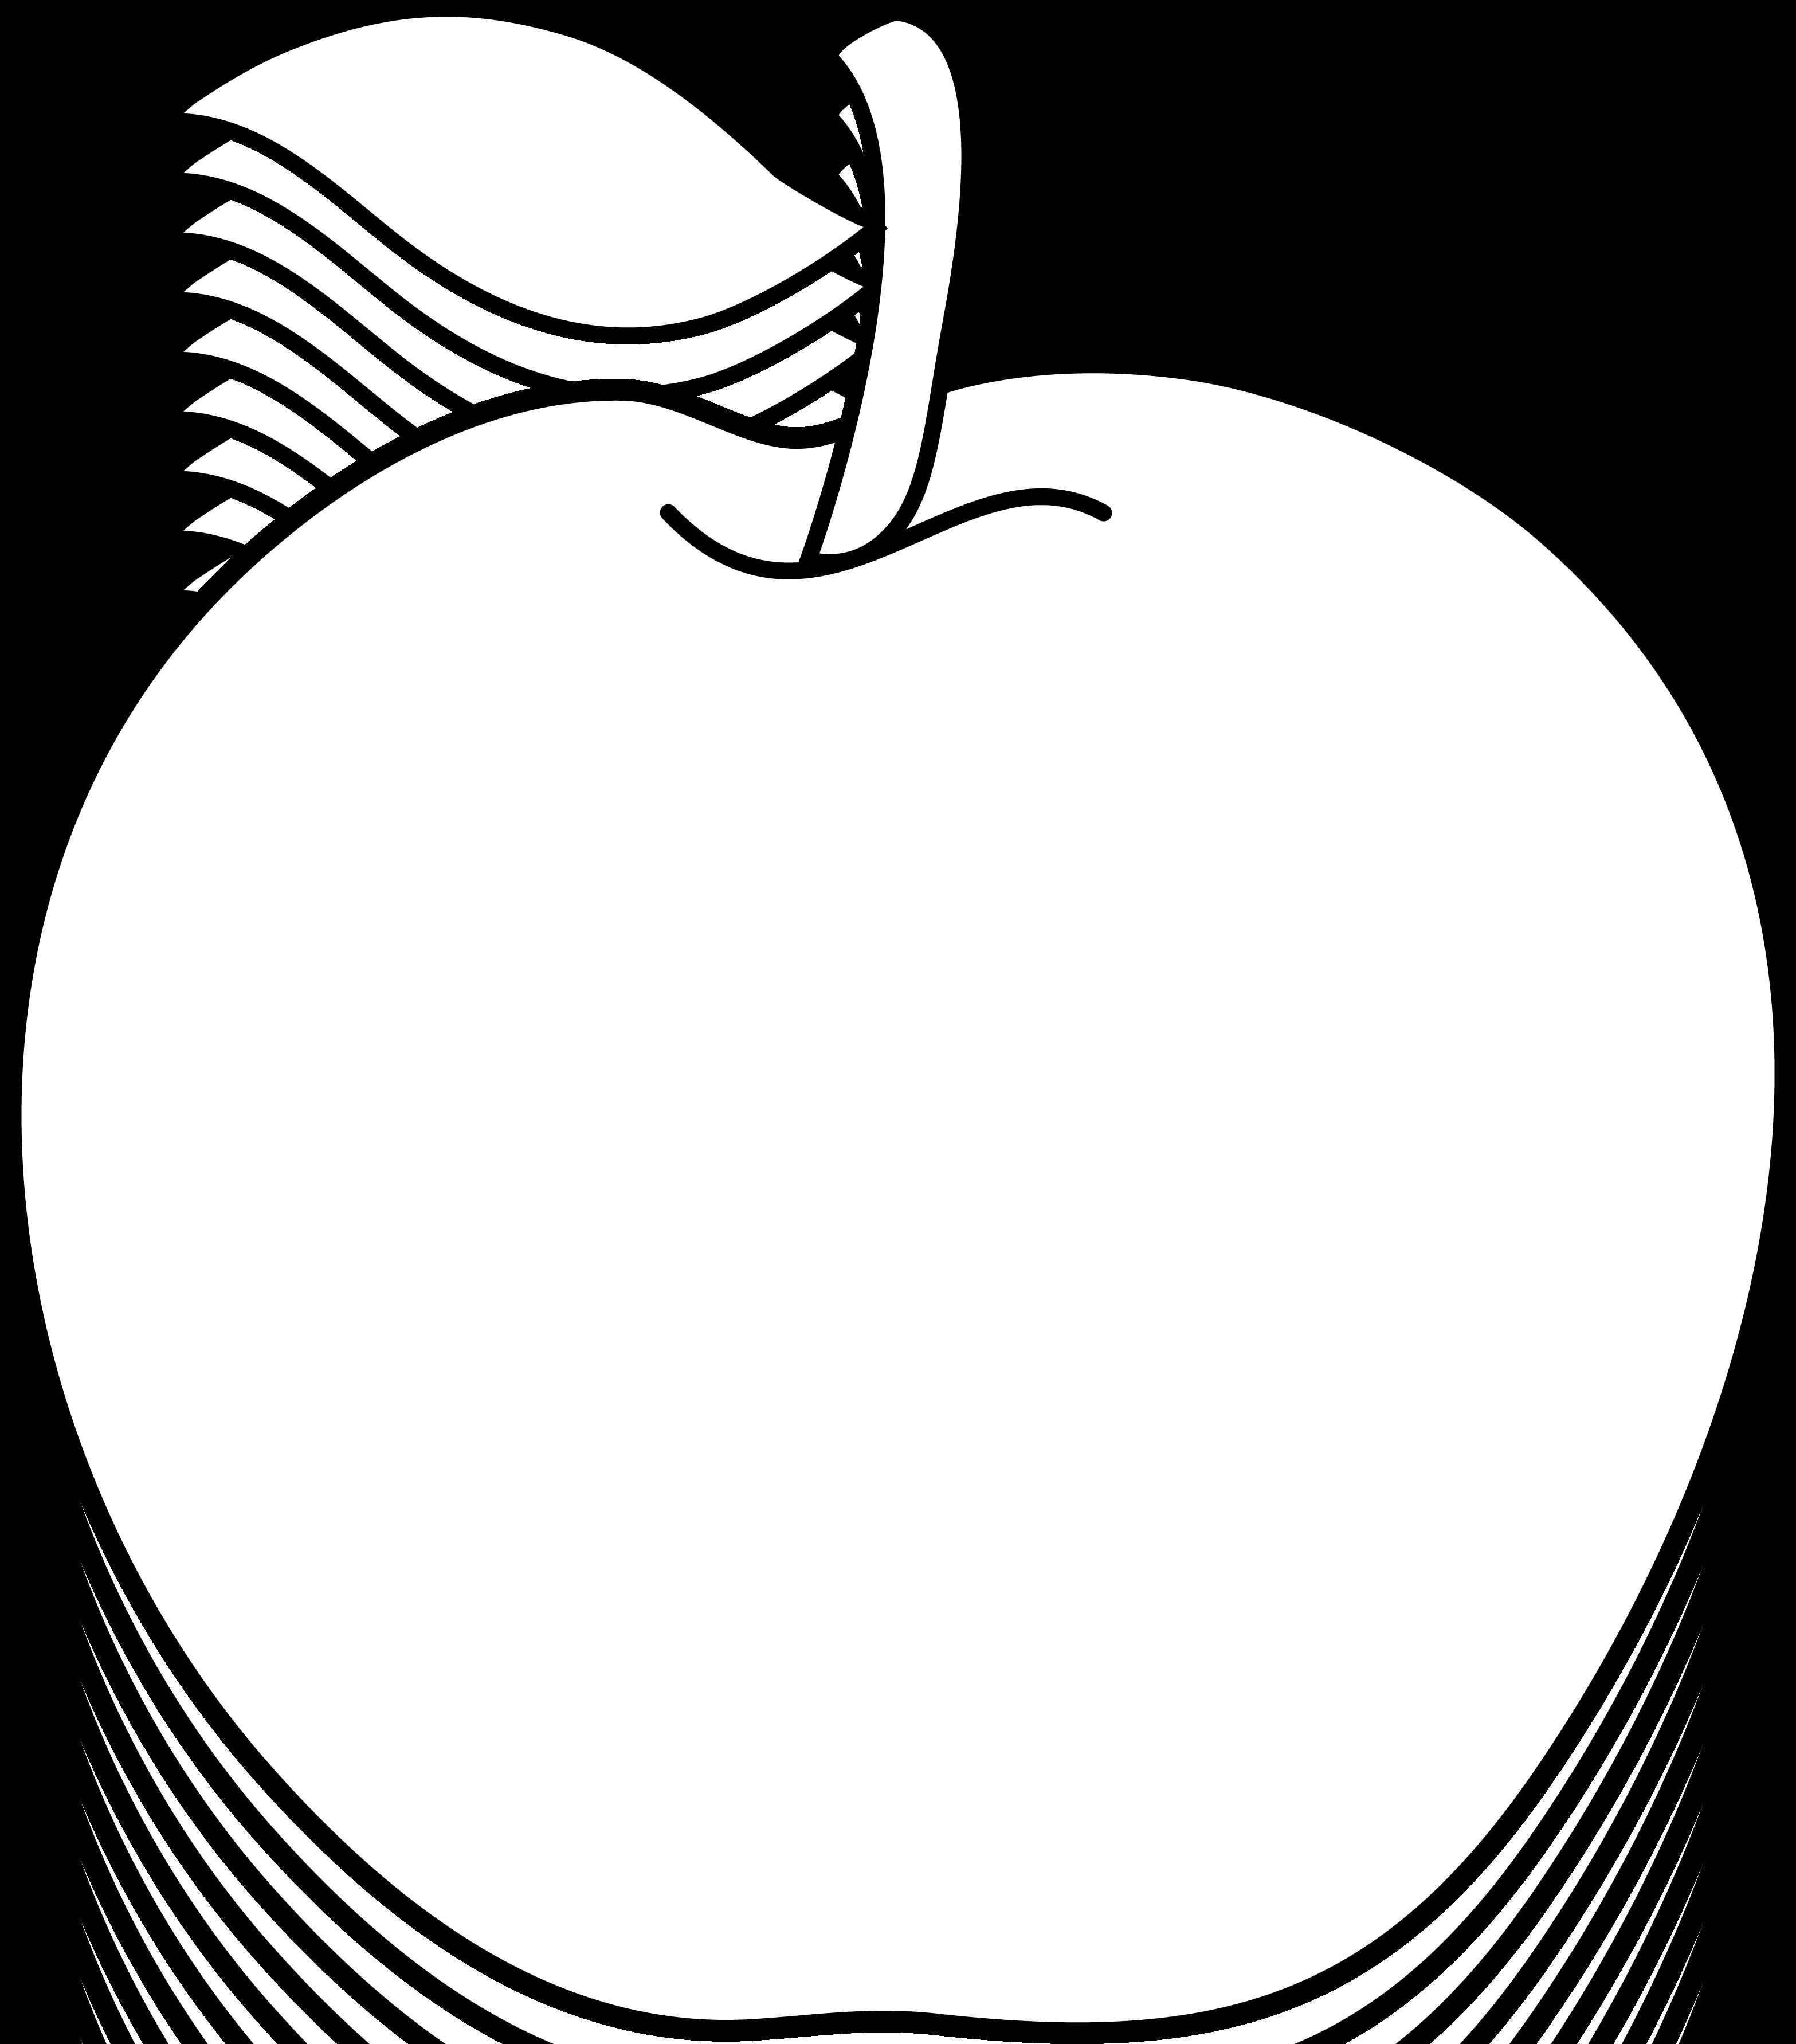 Design clipart fruit. Teacher apple black and